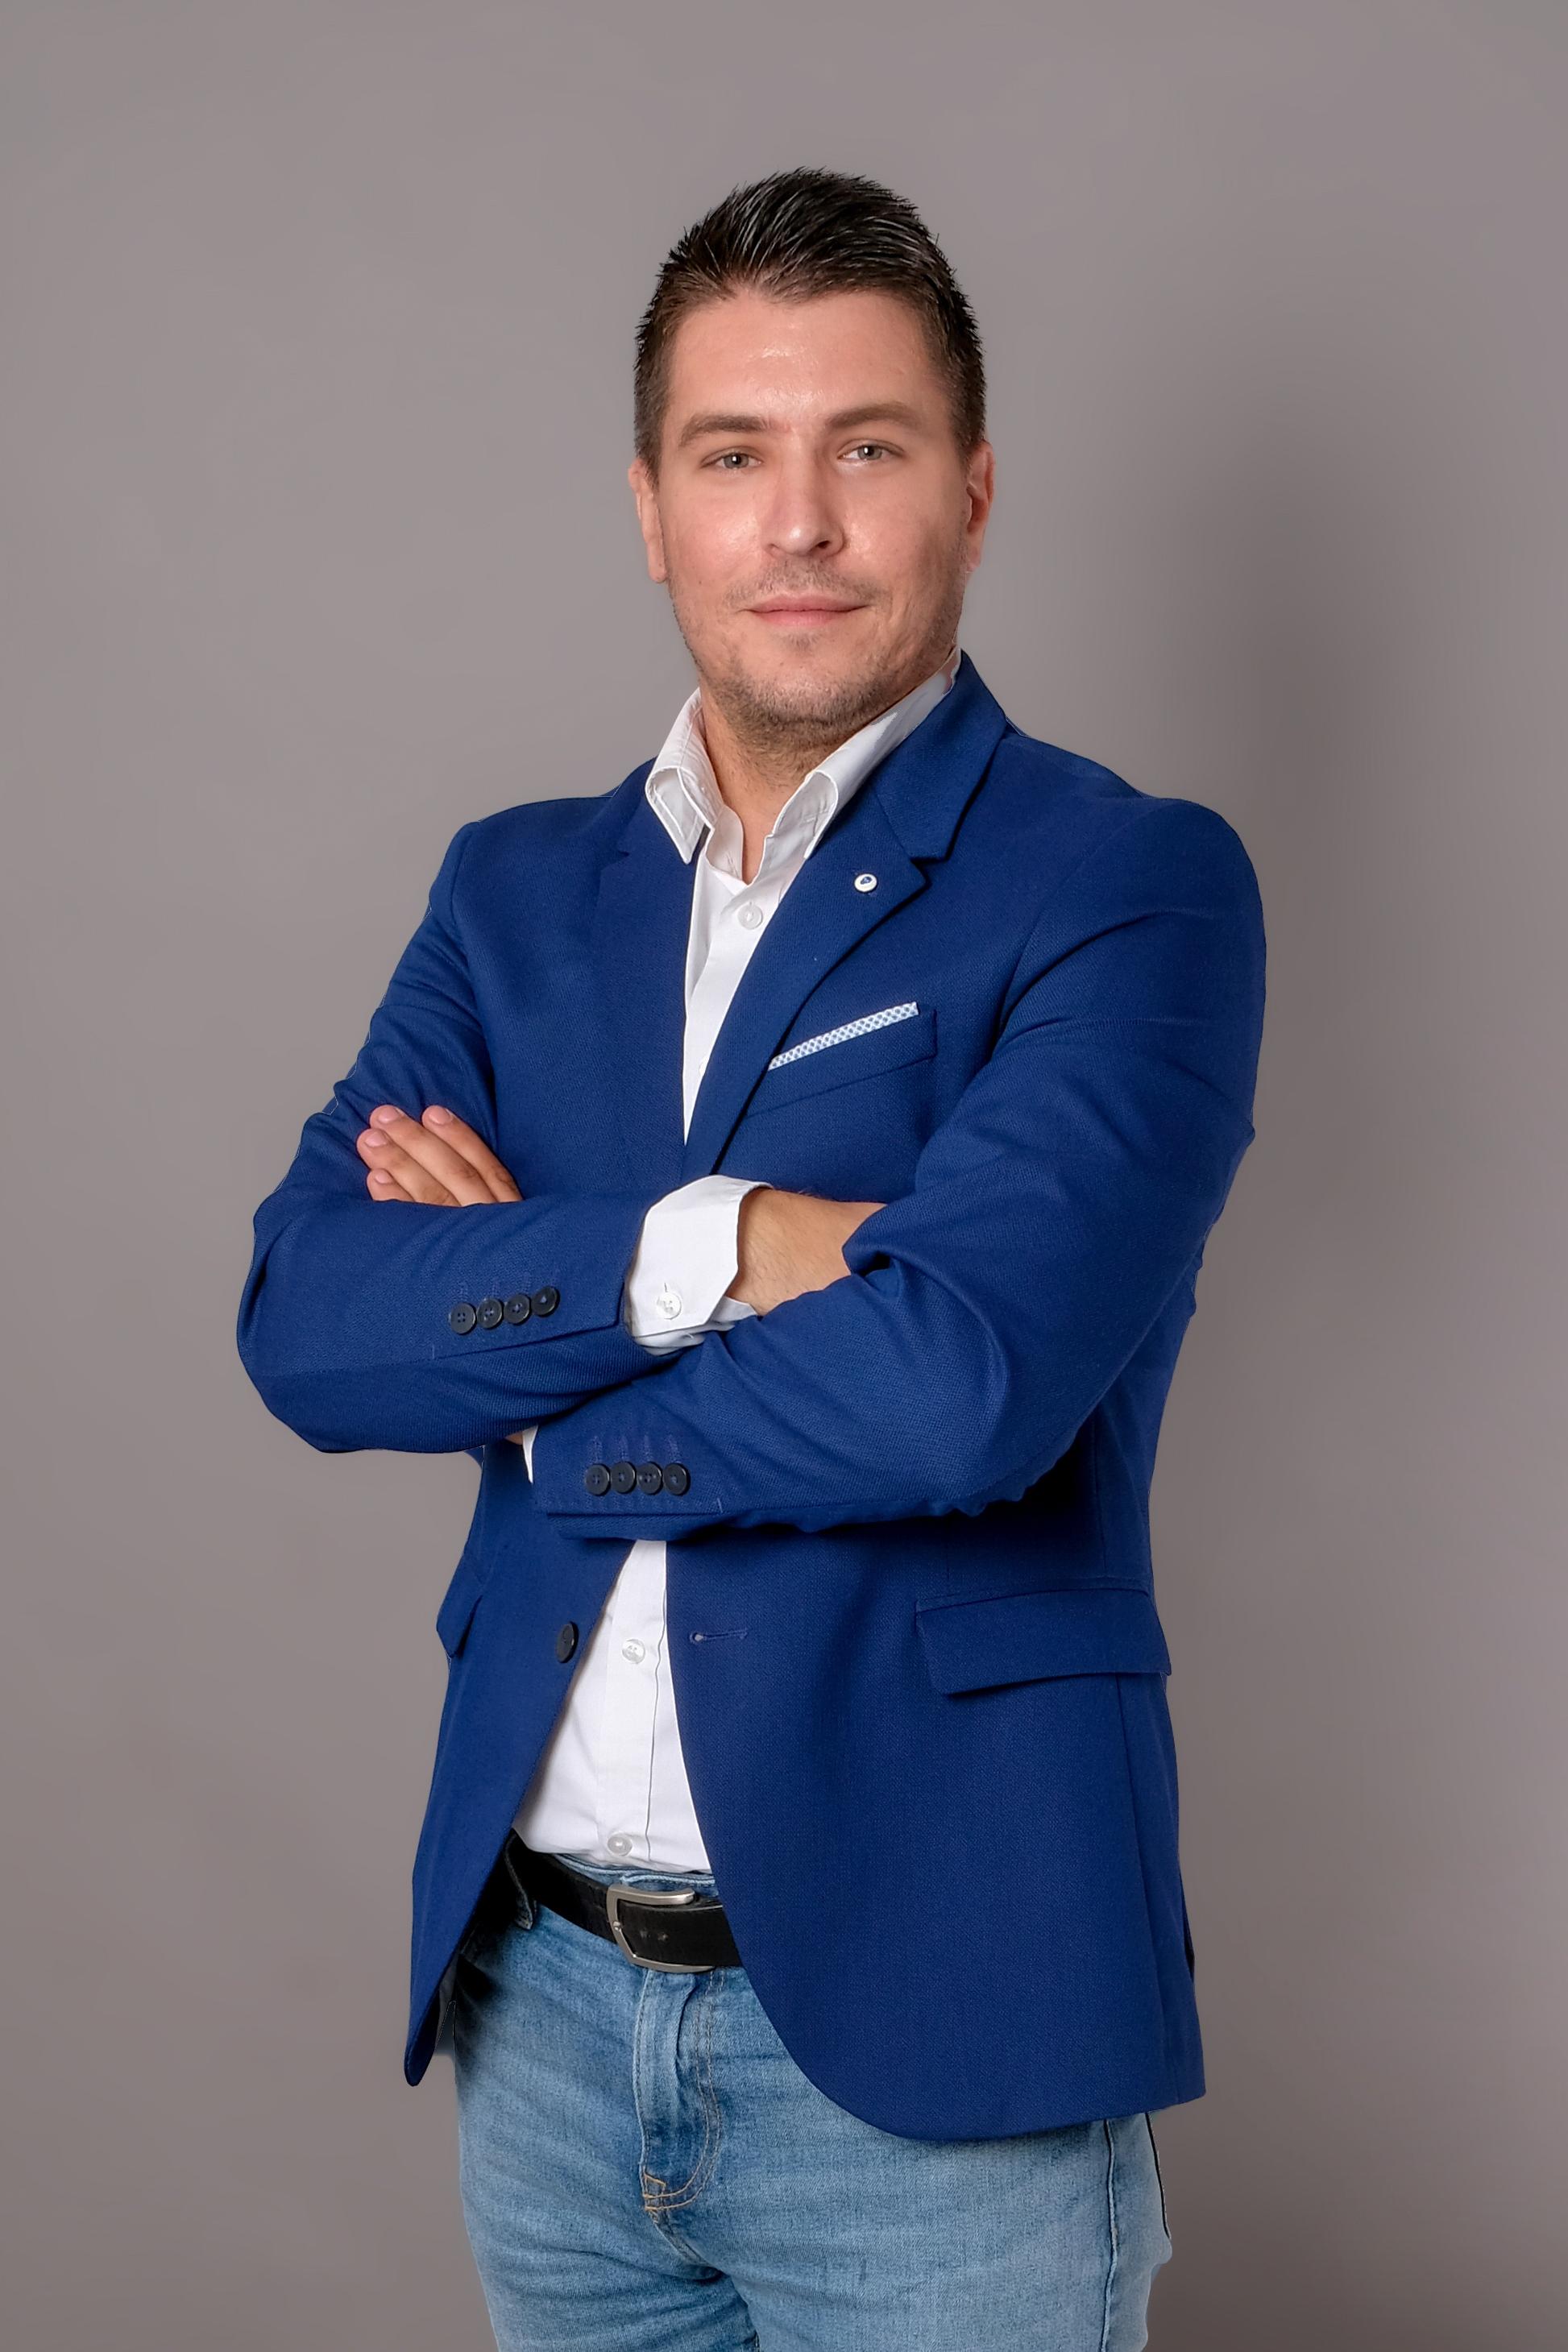 Bernis Dedić